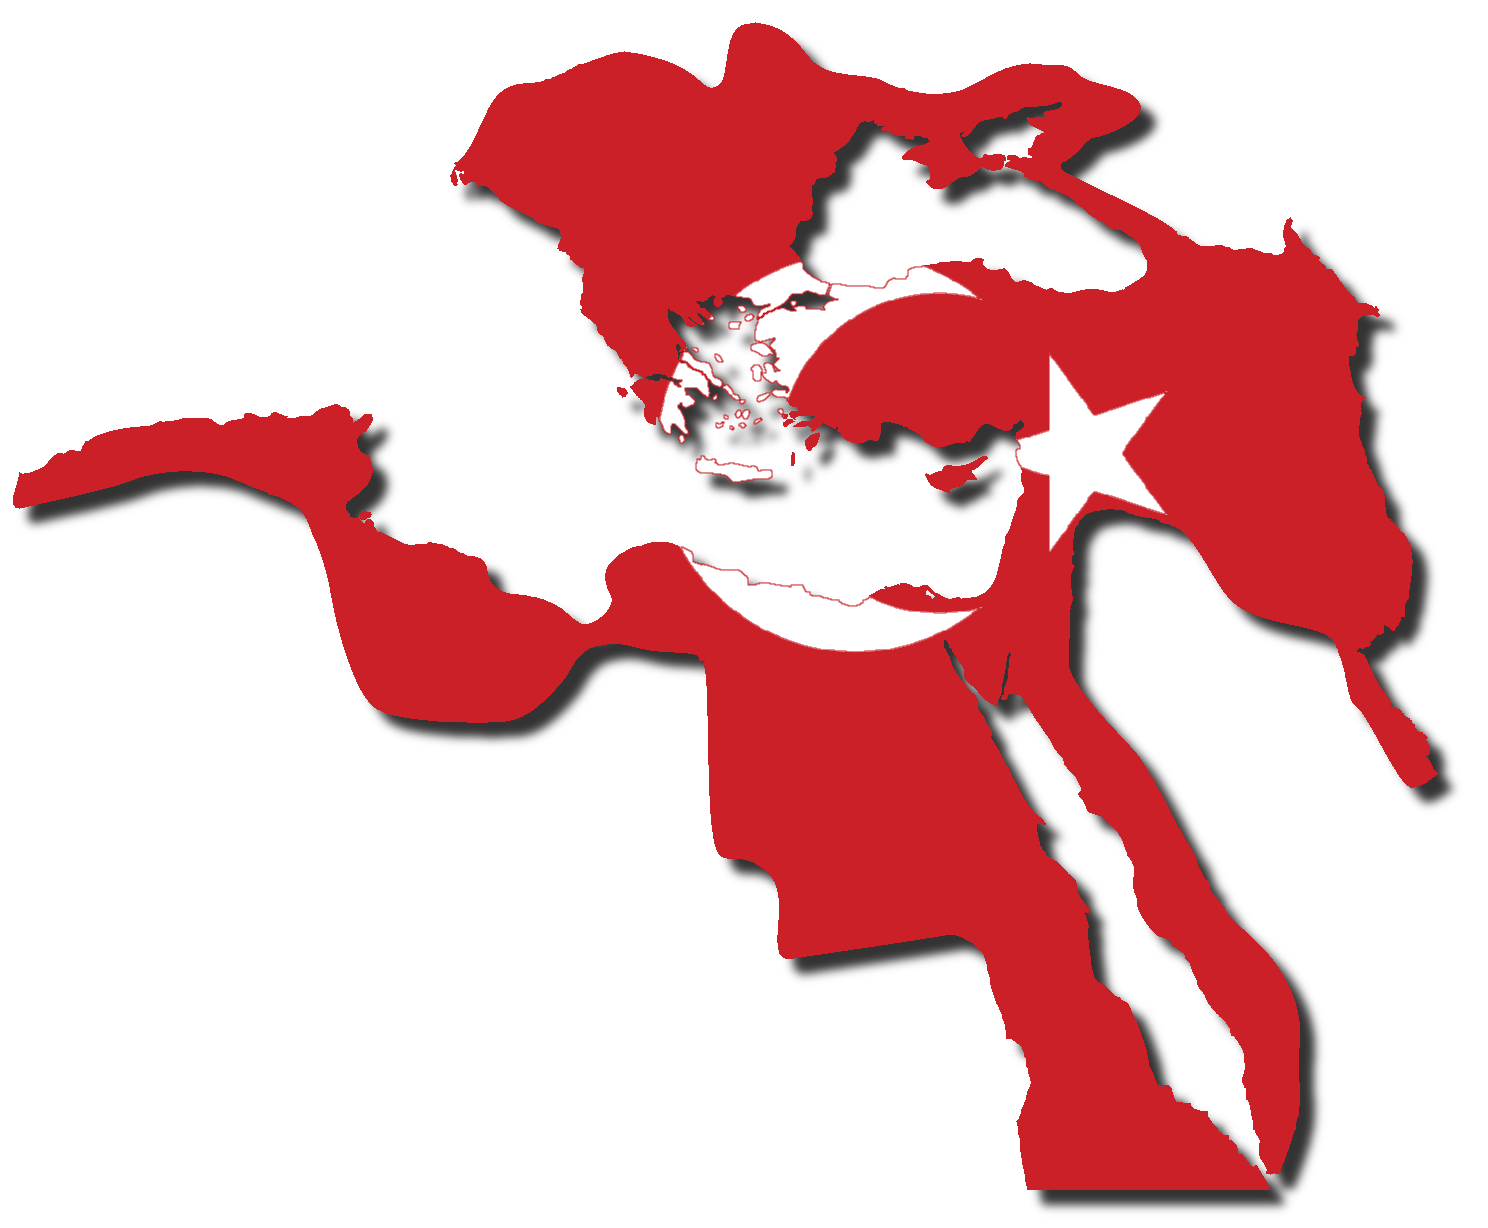 mediterranean countries flag map by captainvoda on deviantart